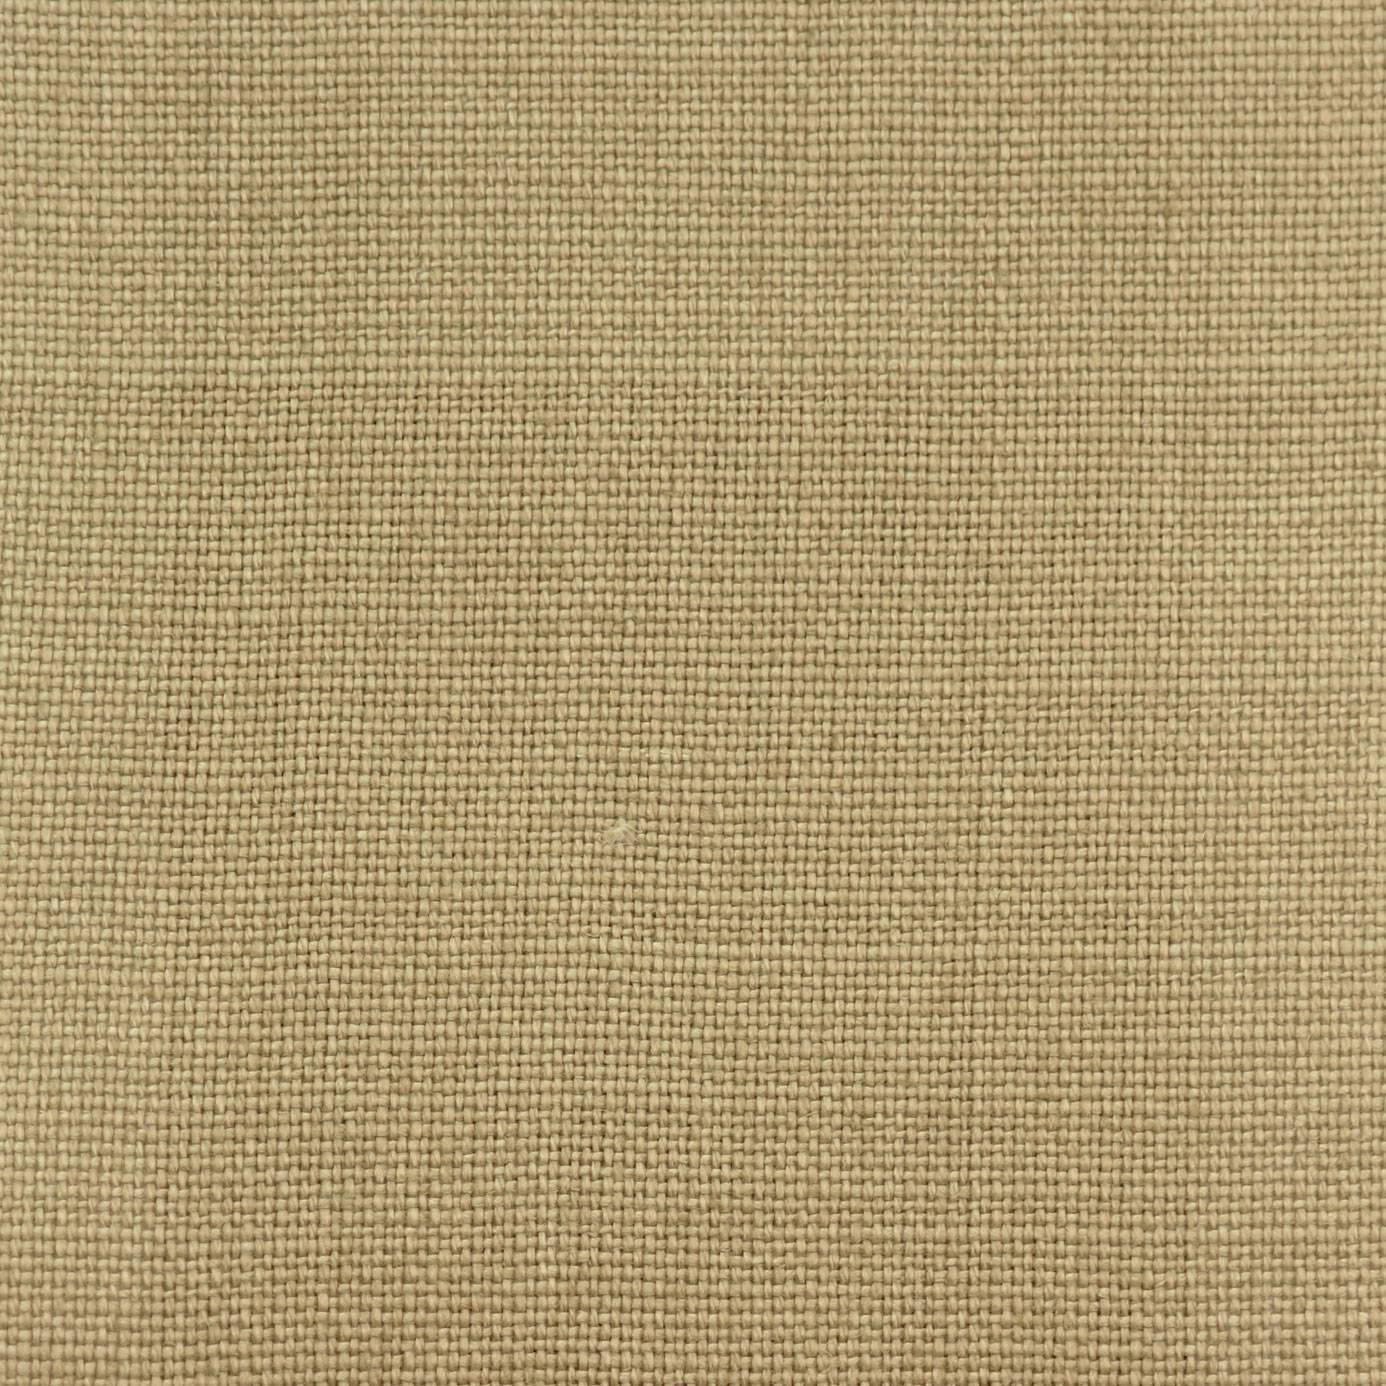 Slubby Linen Fabric Cocoa Slubby Linen Cocoa Warwick